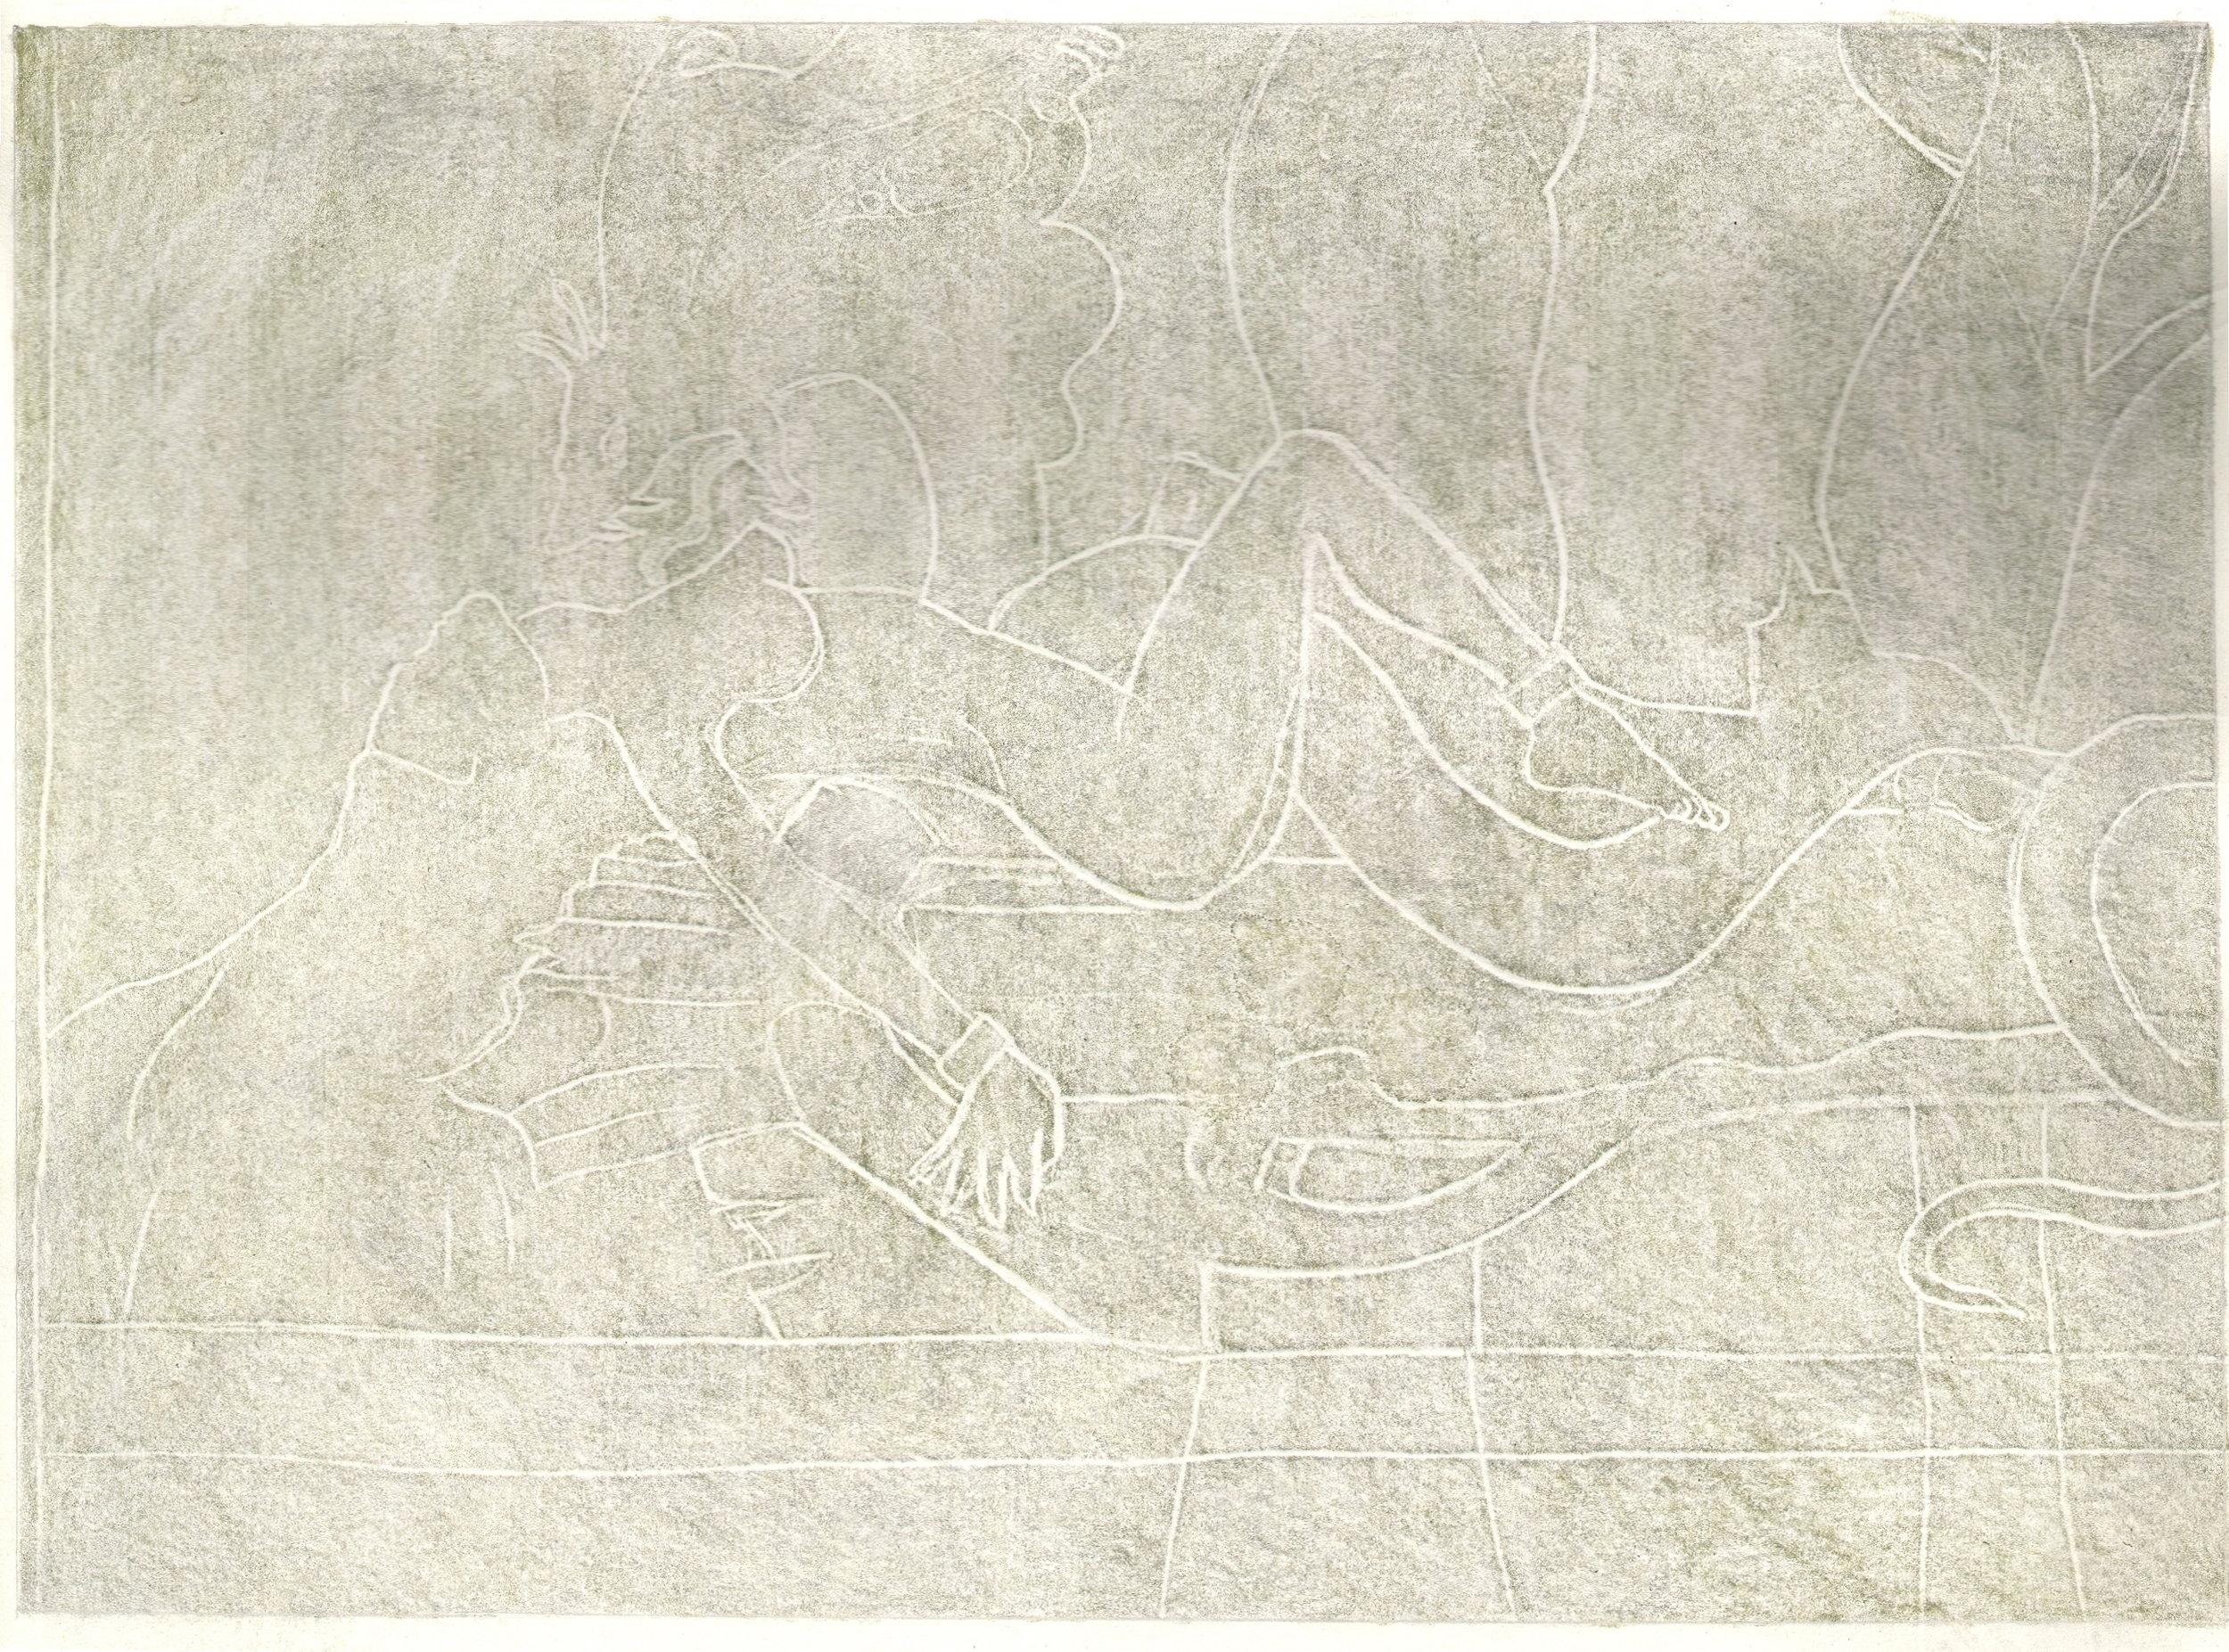 O.T. ( Serie Fantasy XI Boris Vallejo Paraphrase sw ), 2018  Bleistift Buntstift auf Papier, 26x35.5cm